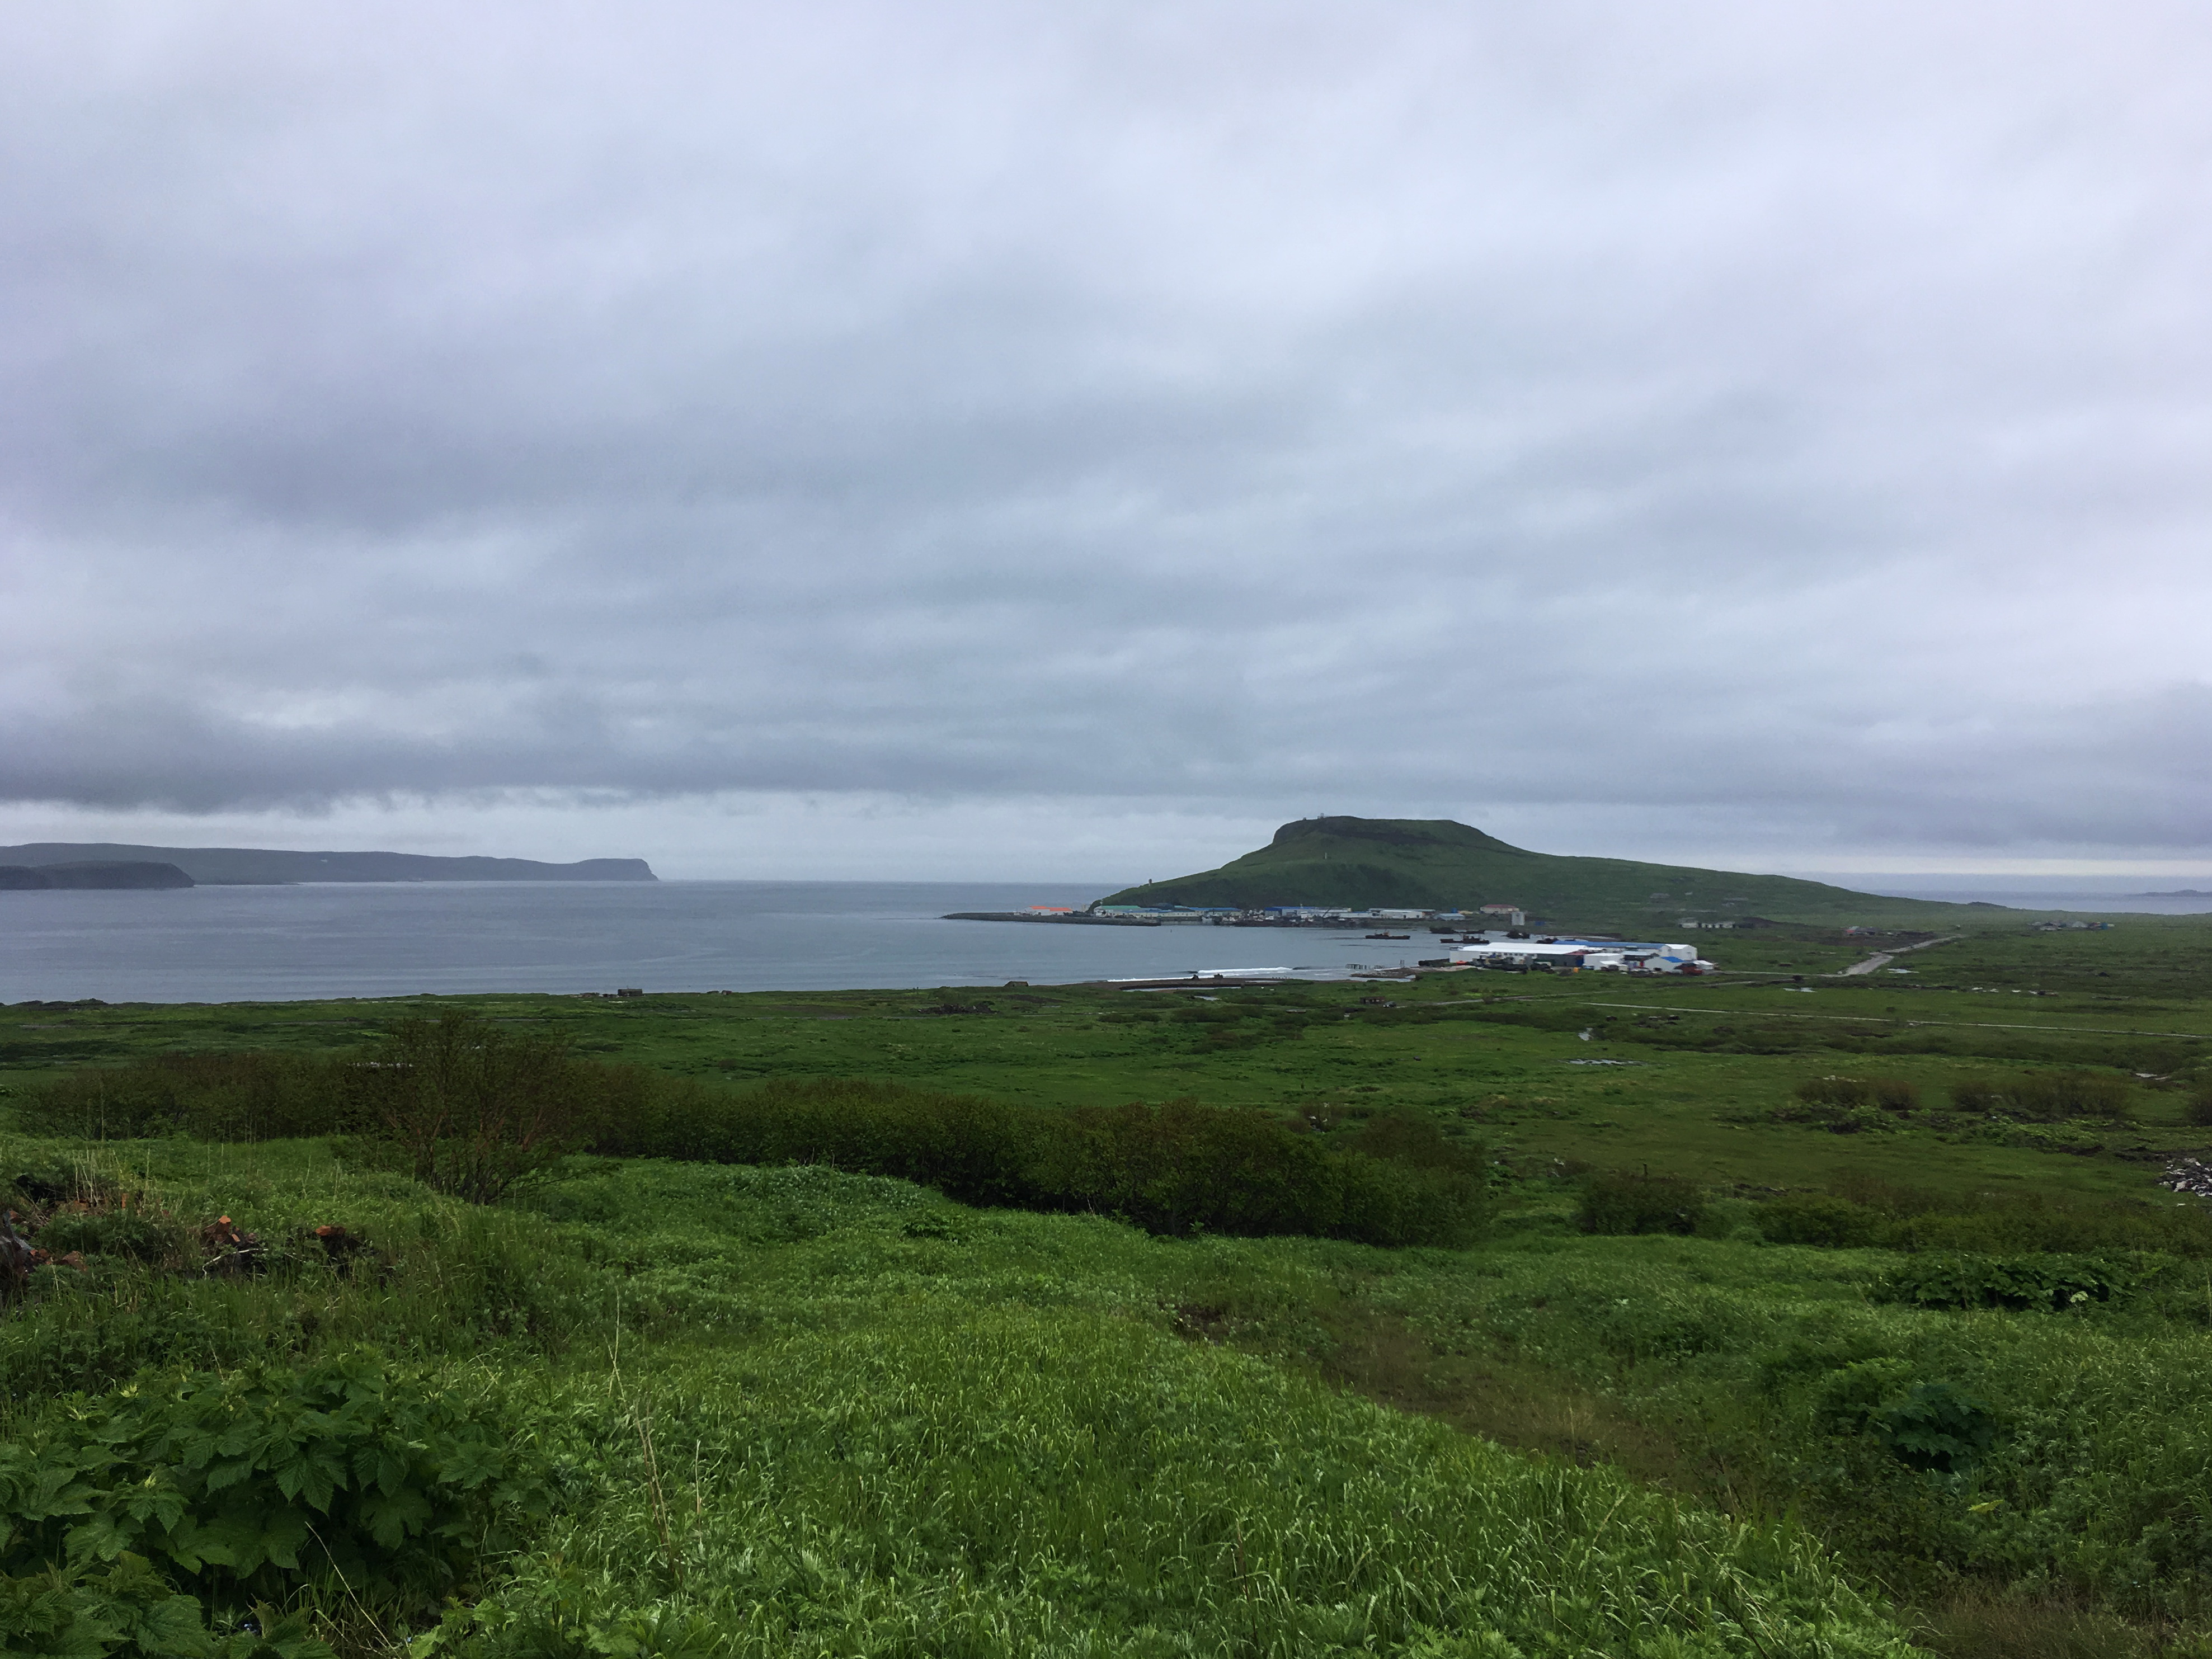 порт Северо-Курильска, вид с холма